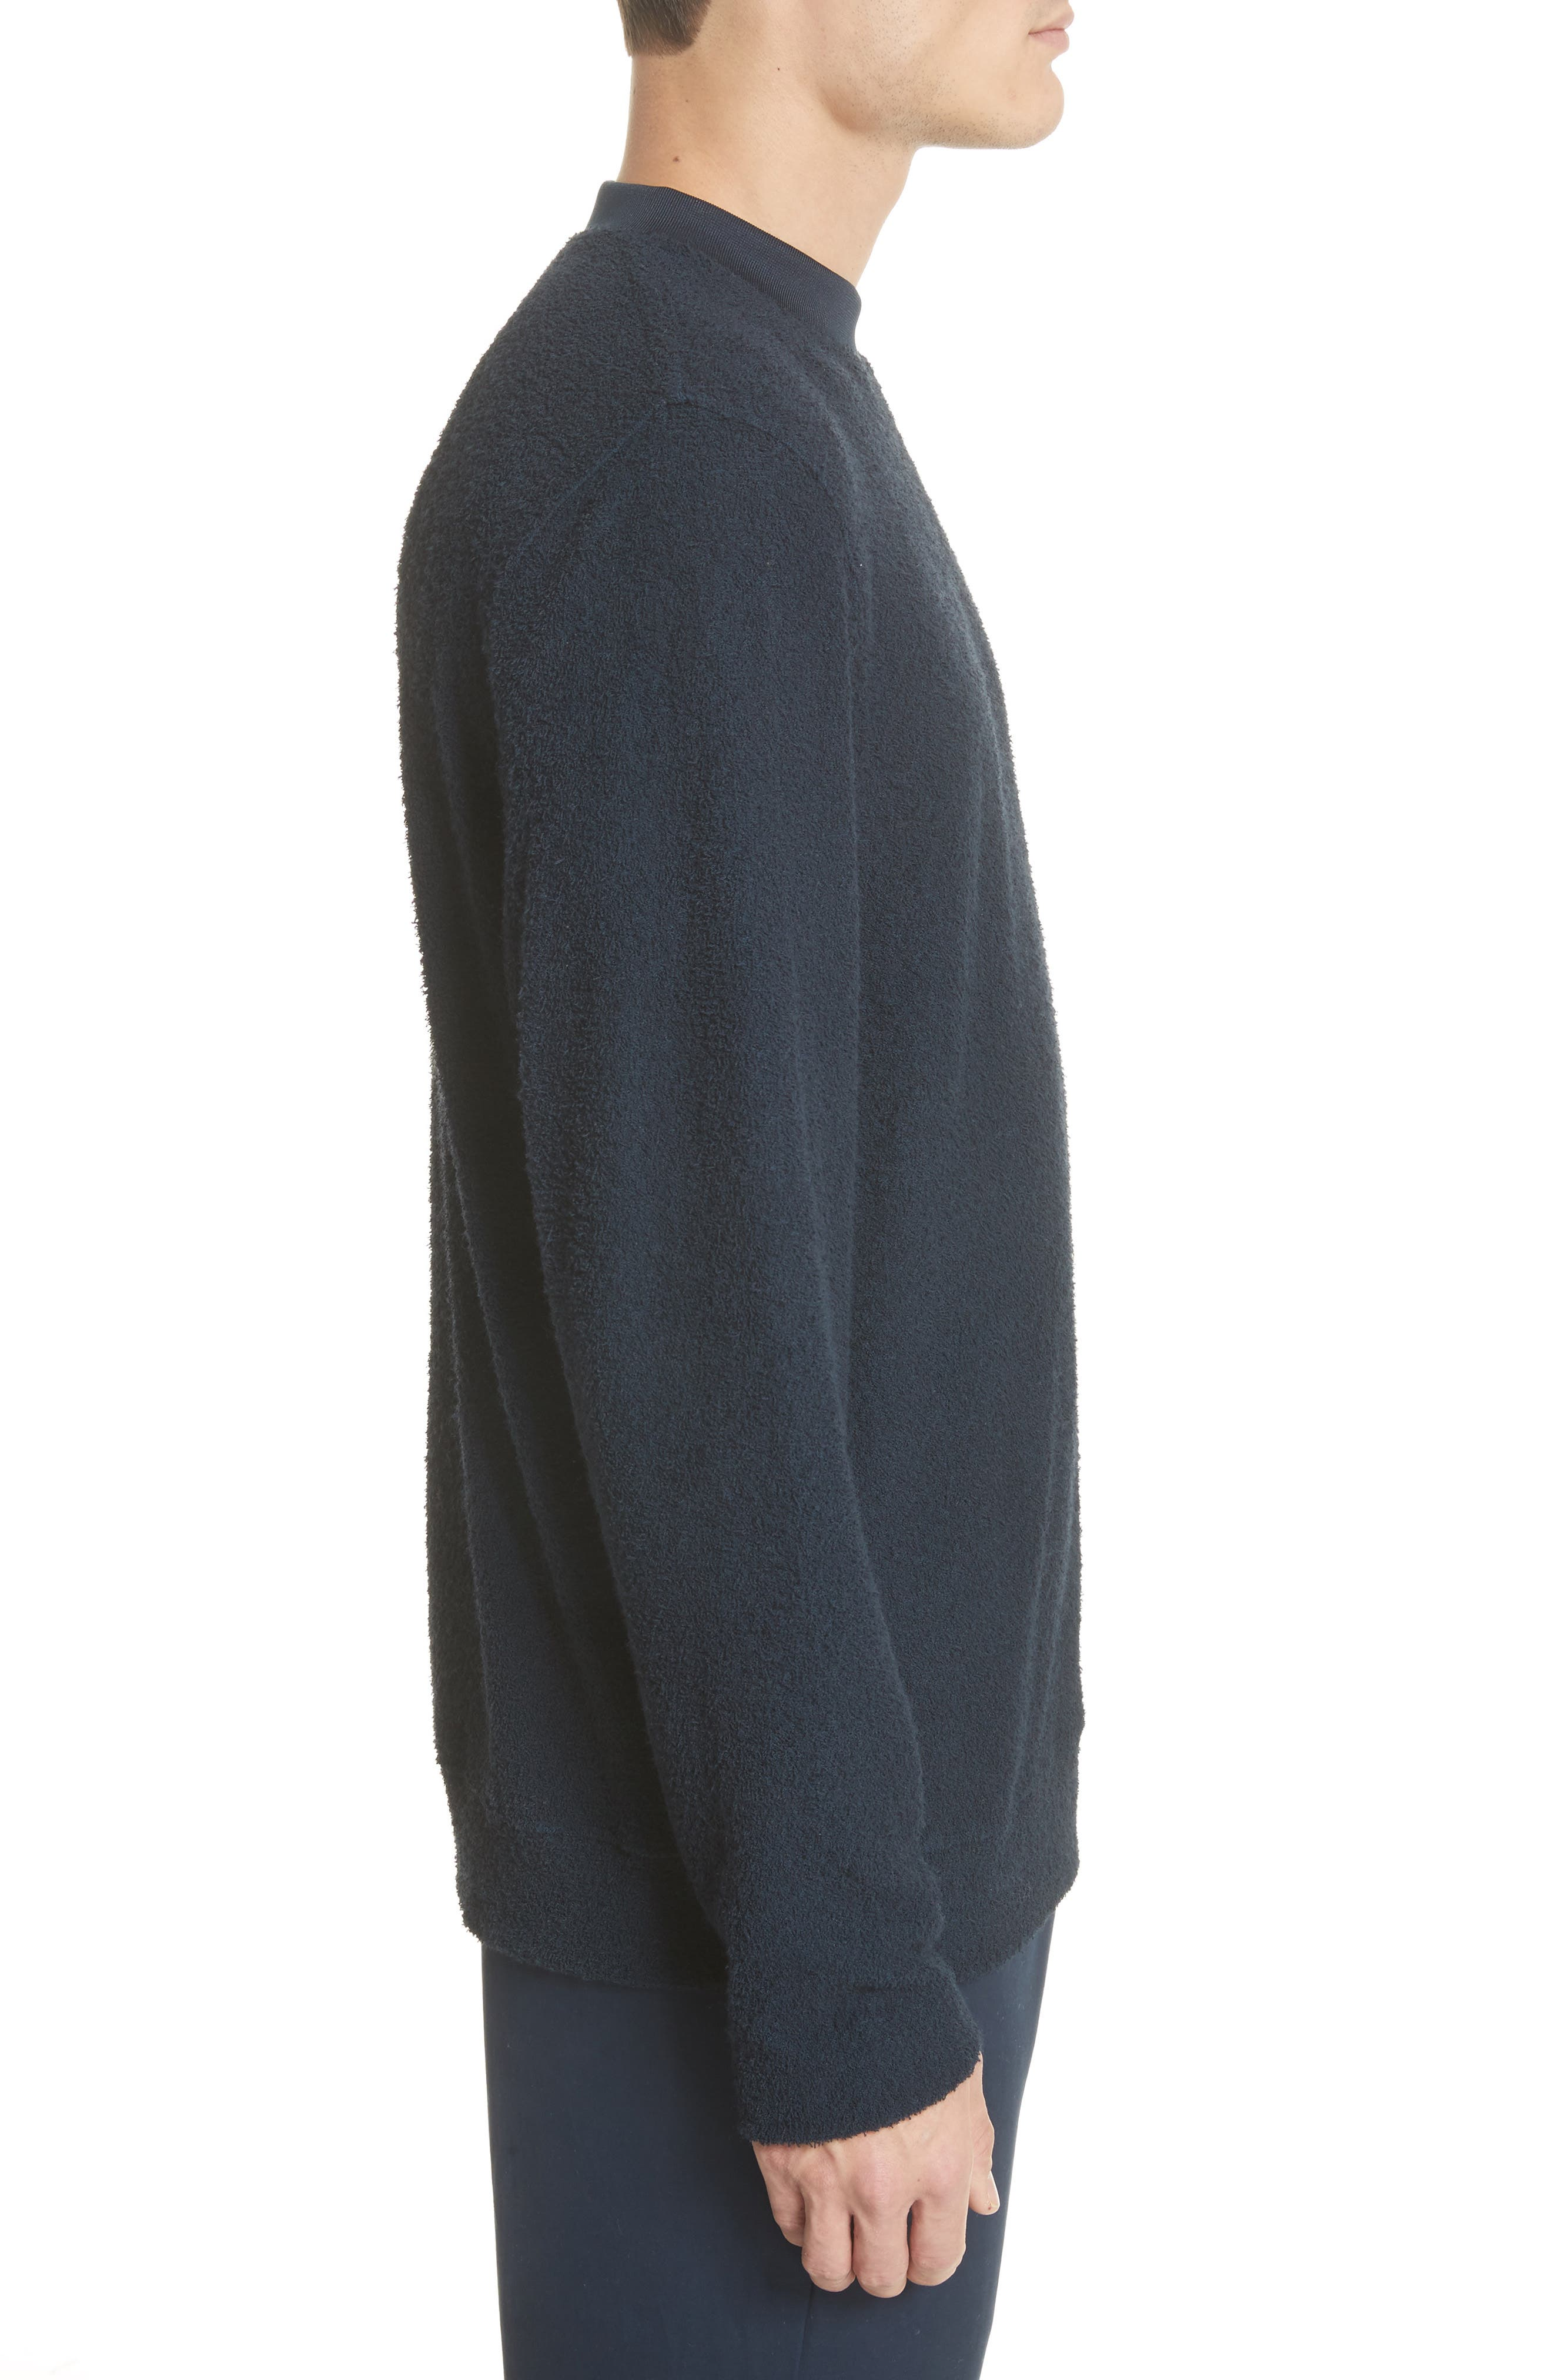 Rask Crewneck Sweatshirt,                             Alternate thumbnail 3, color,                             Dark Navy